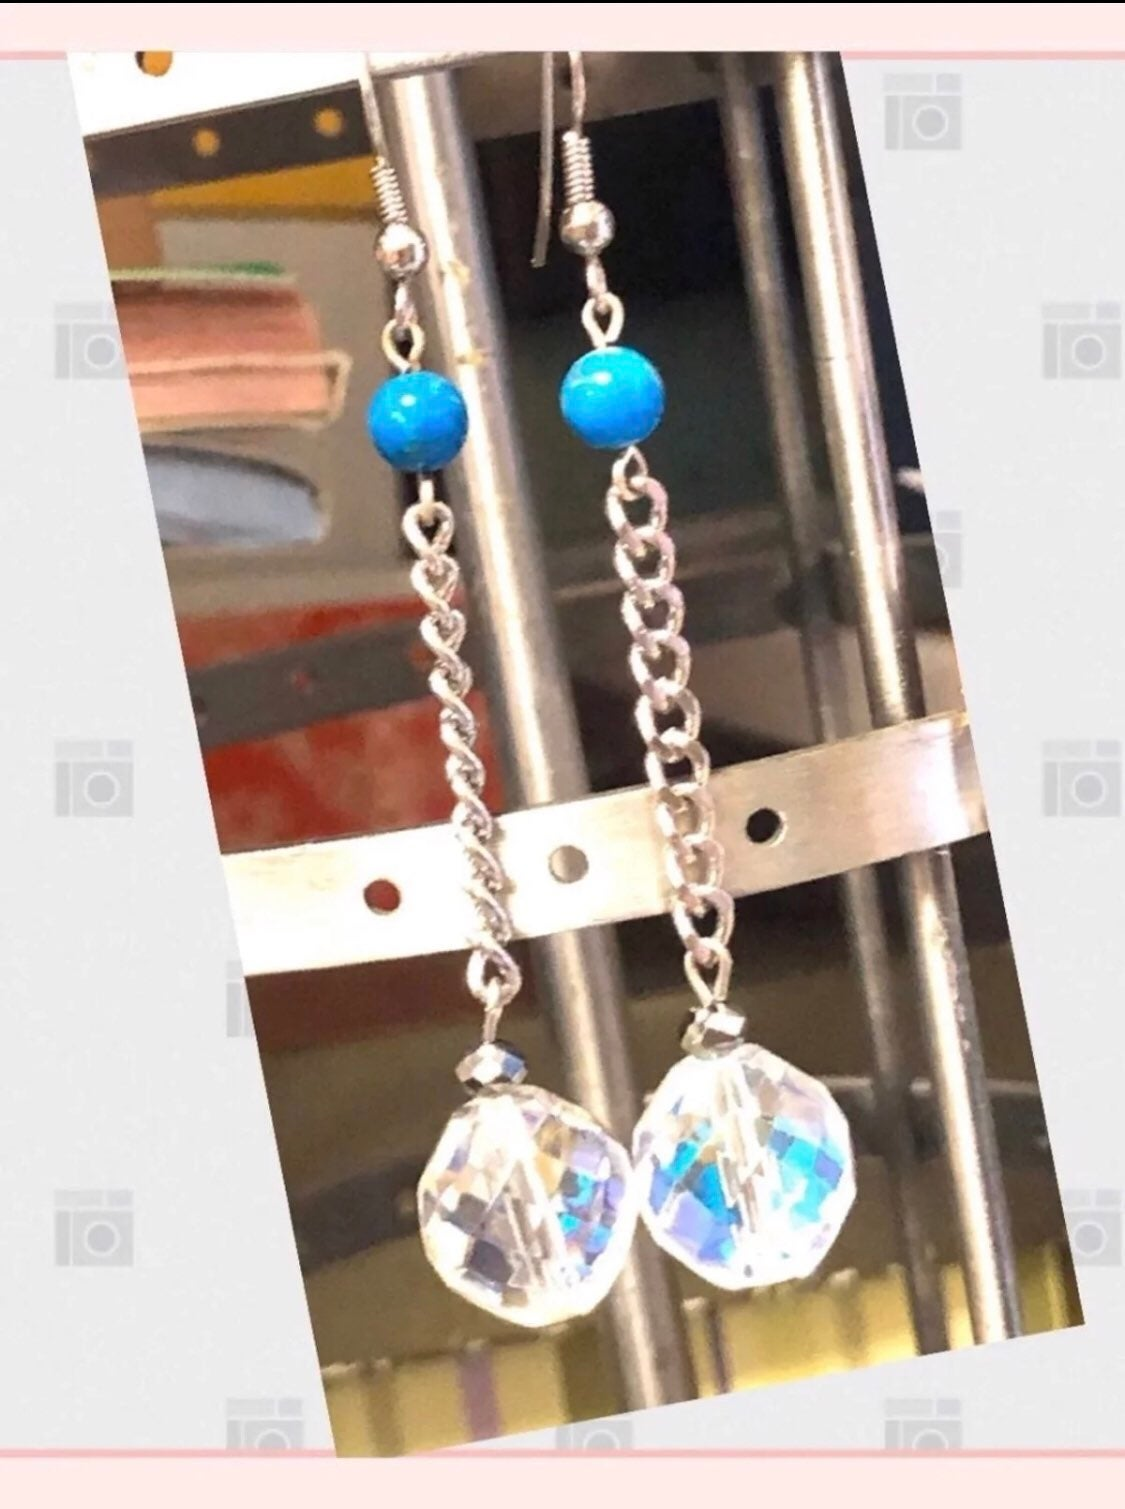 Long earrings boutique jewelry NEW